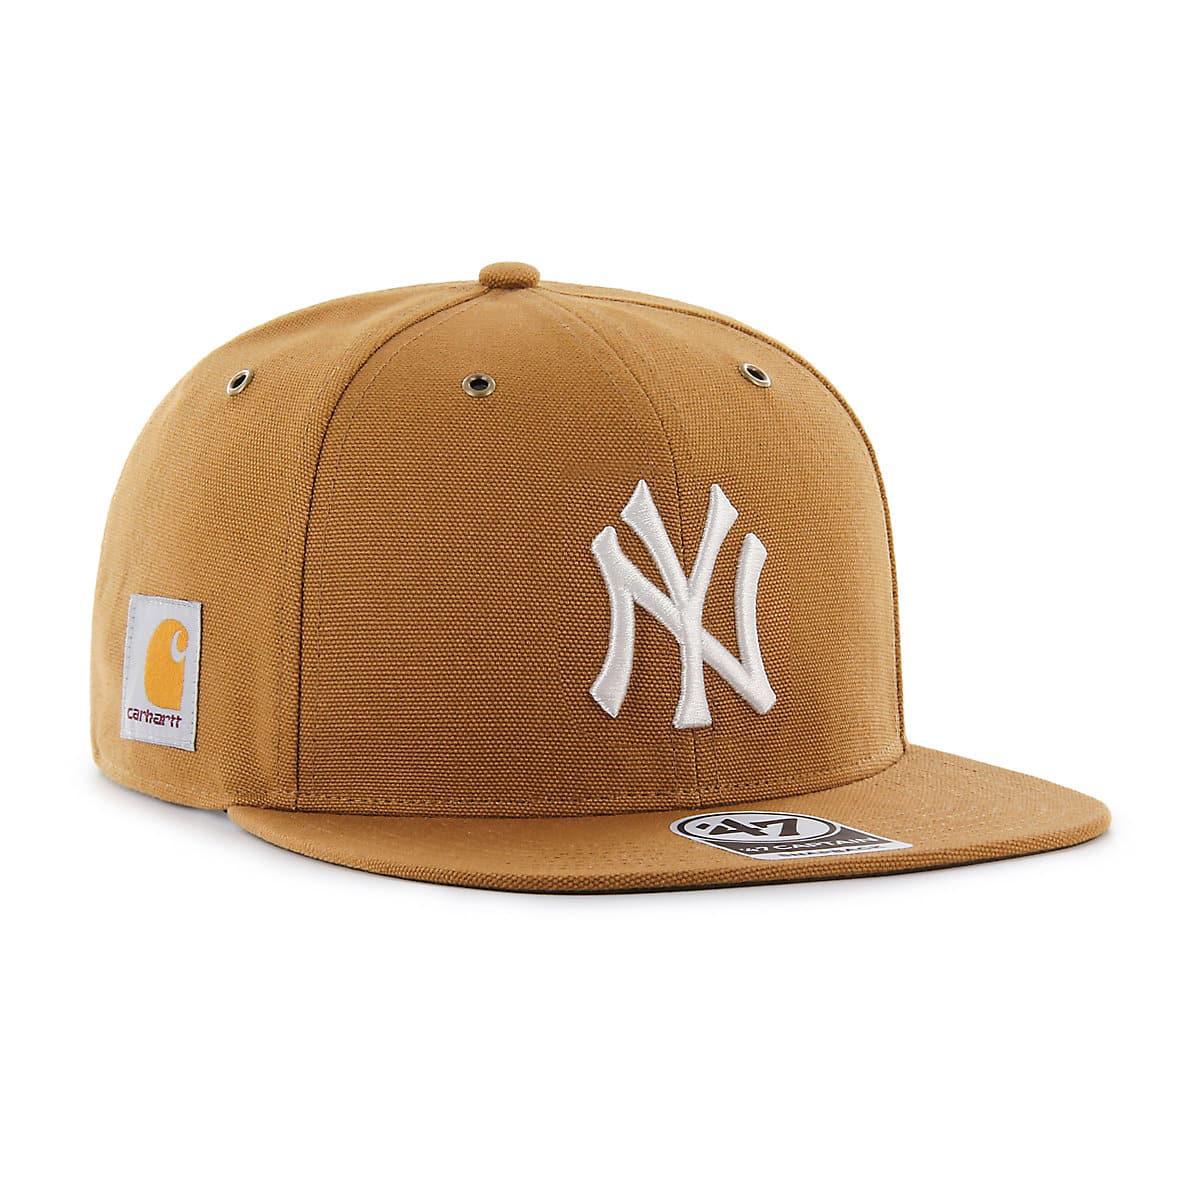 551b21ead91f5 Men s New York Yankees Carhartt x  47 Captain KMORE117